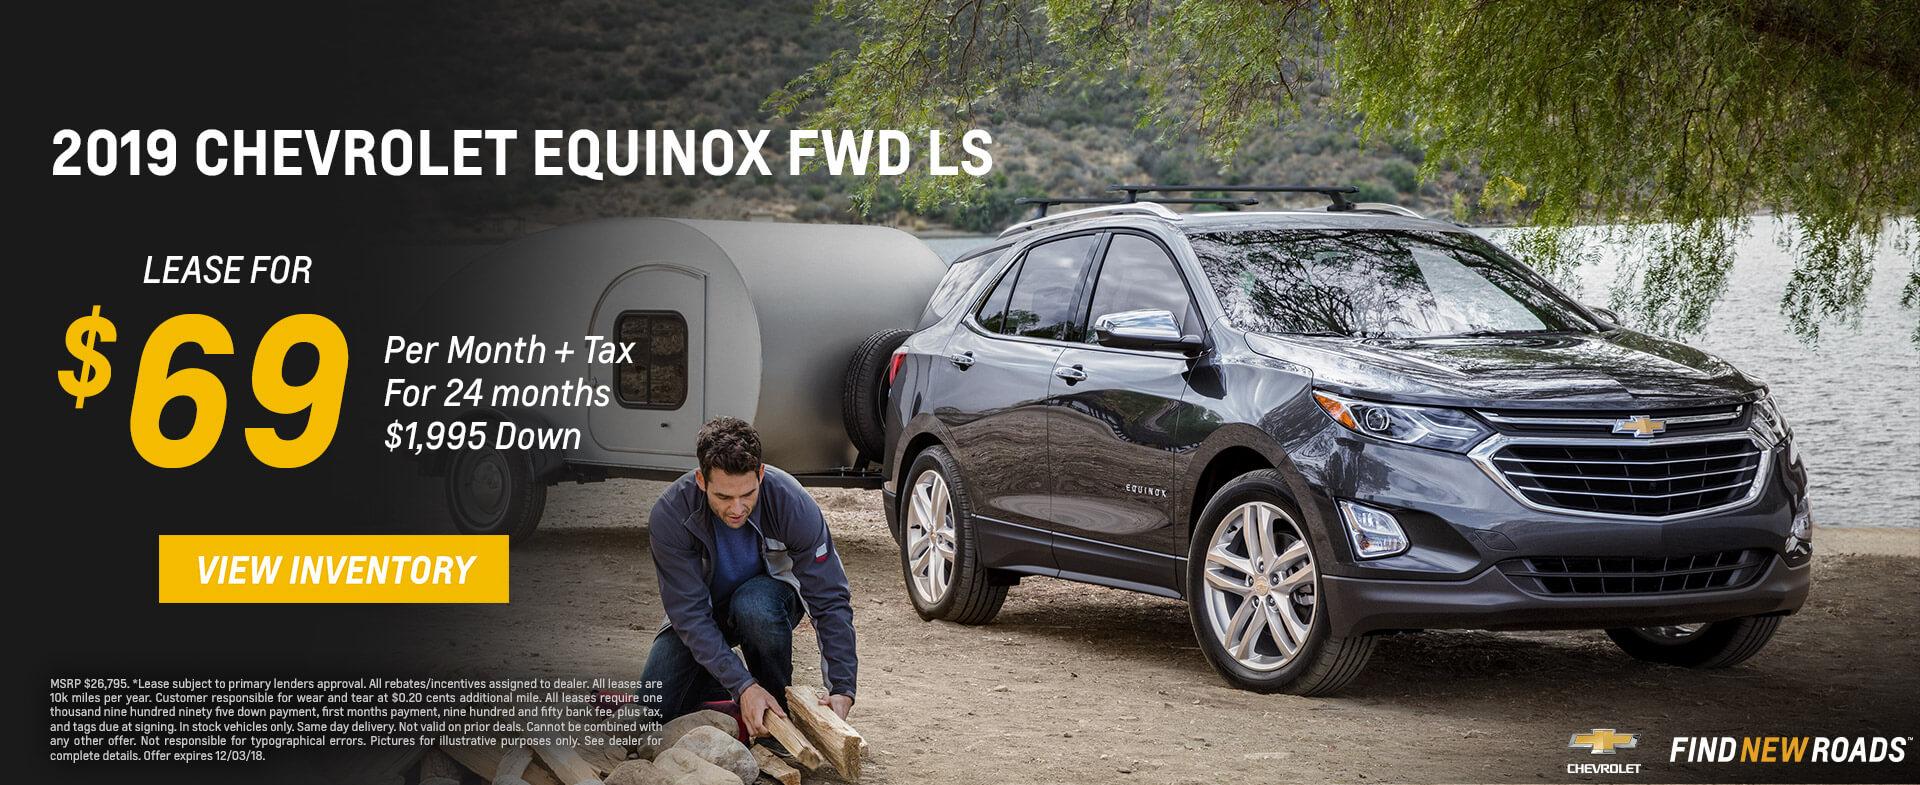 Chevrolet Equinox $69 Lease